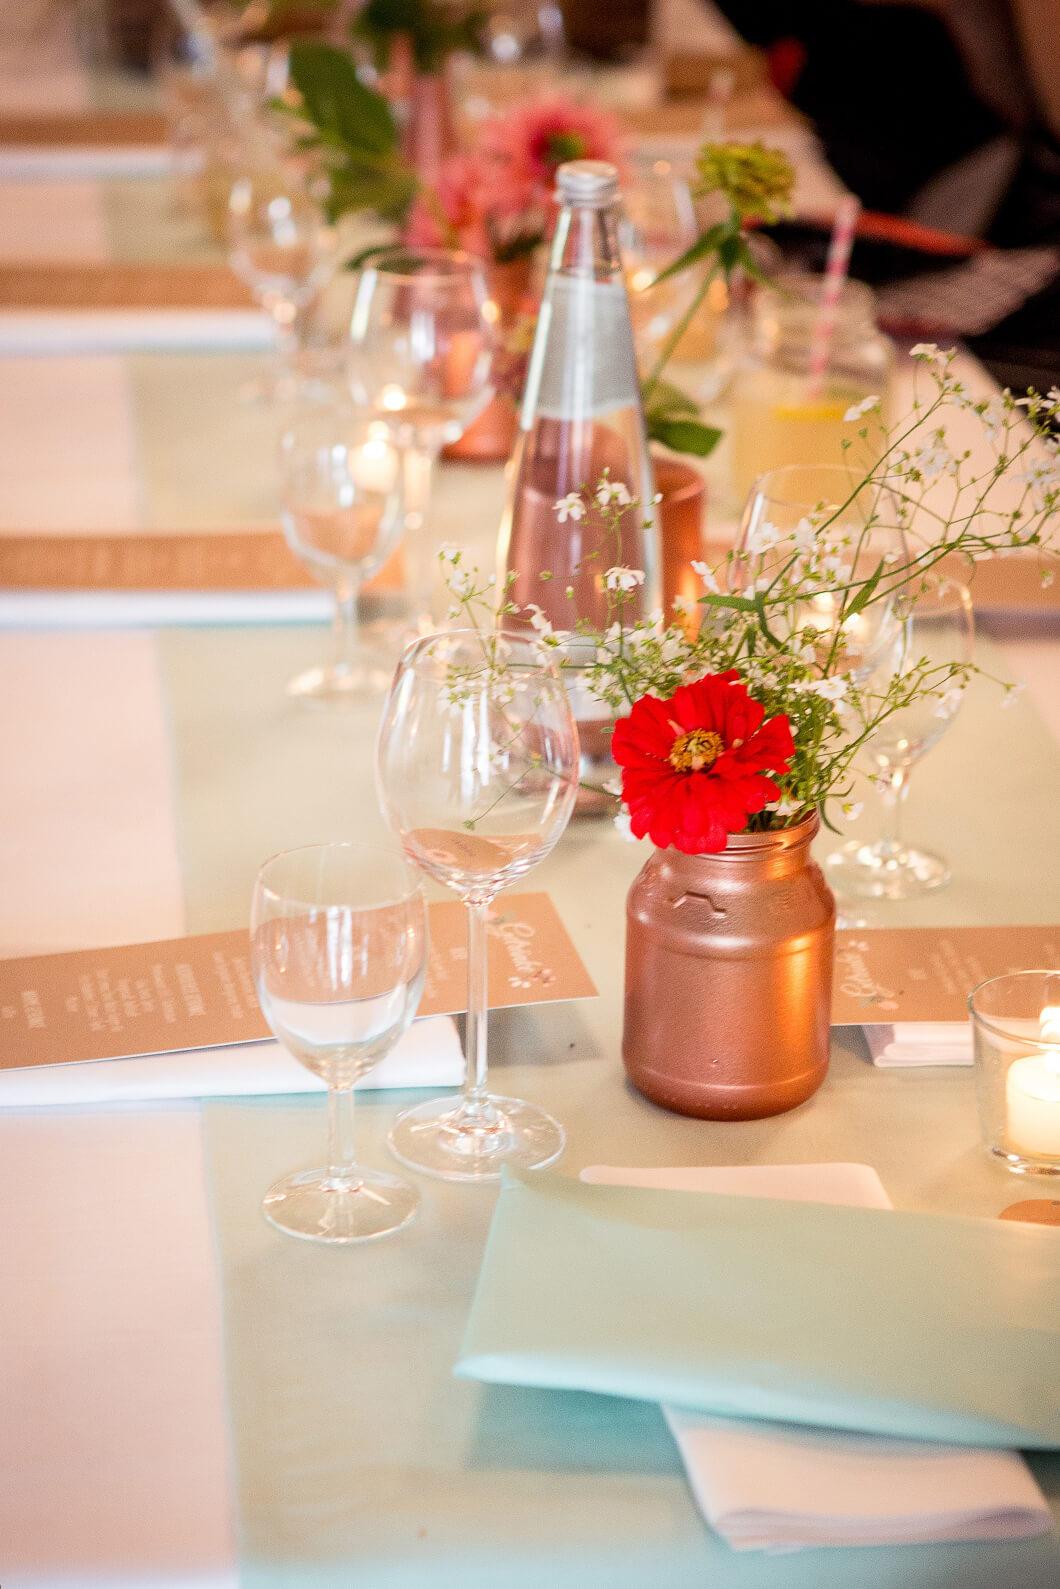 Hochzeitstischdeko, Menükarten, Tischpapeterie, Deko, Kupfer